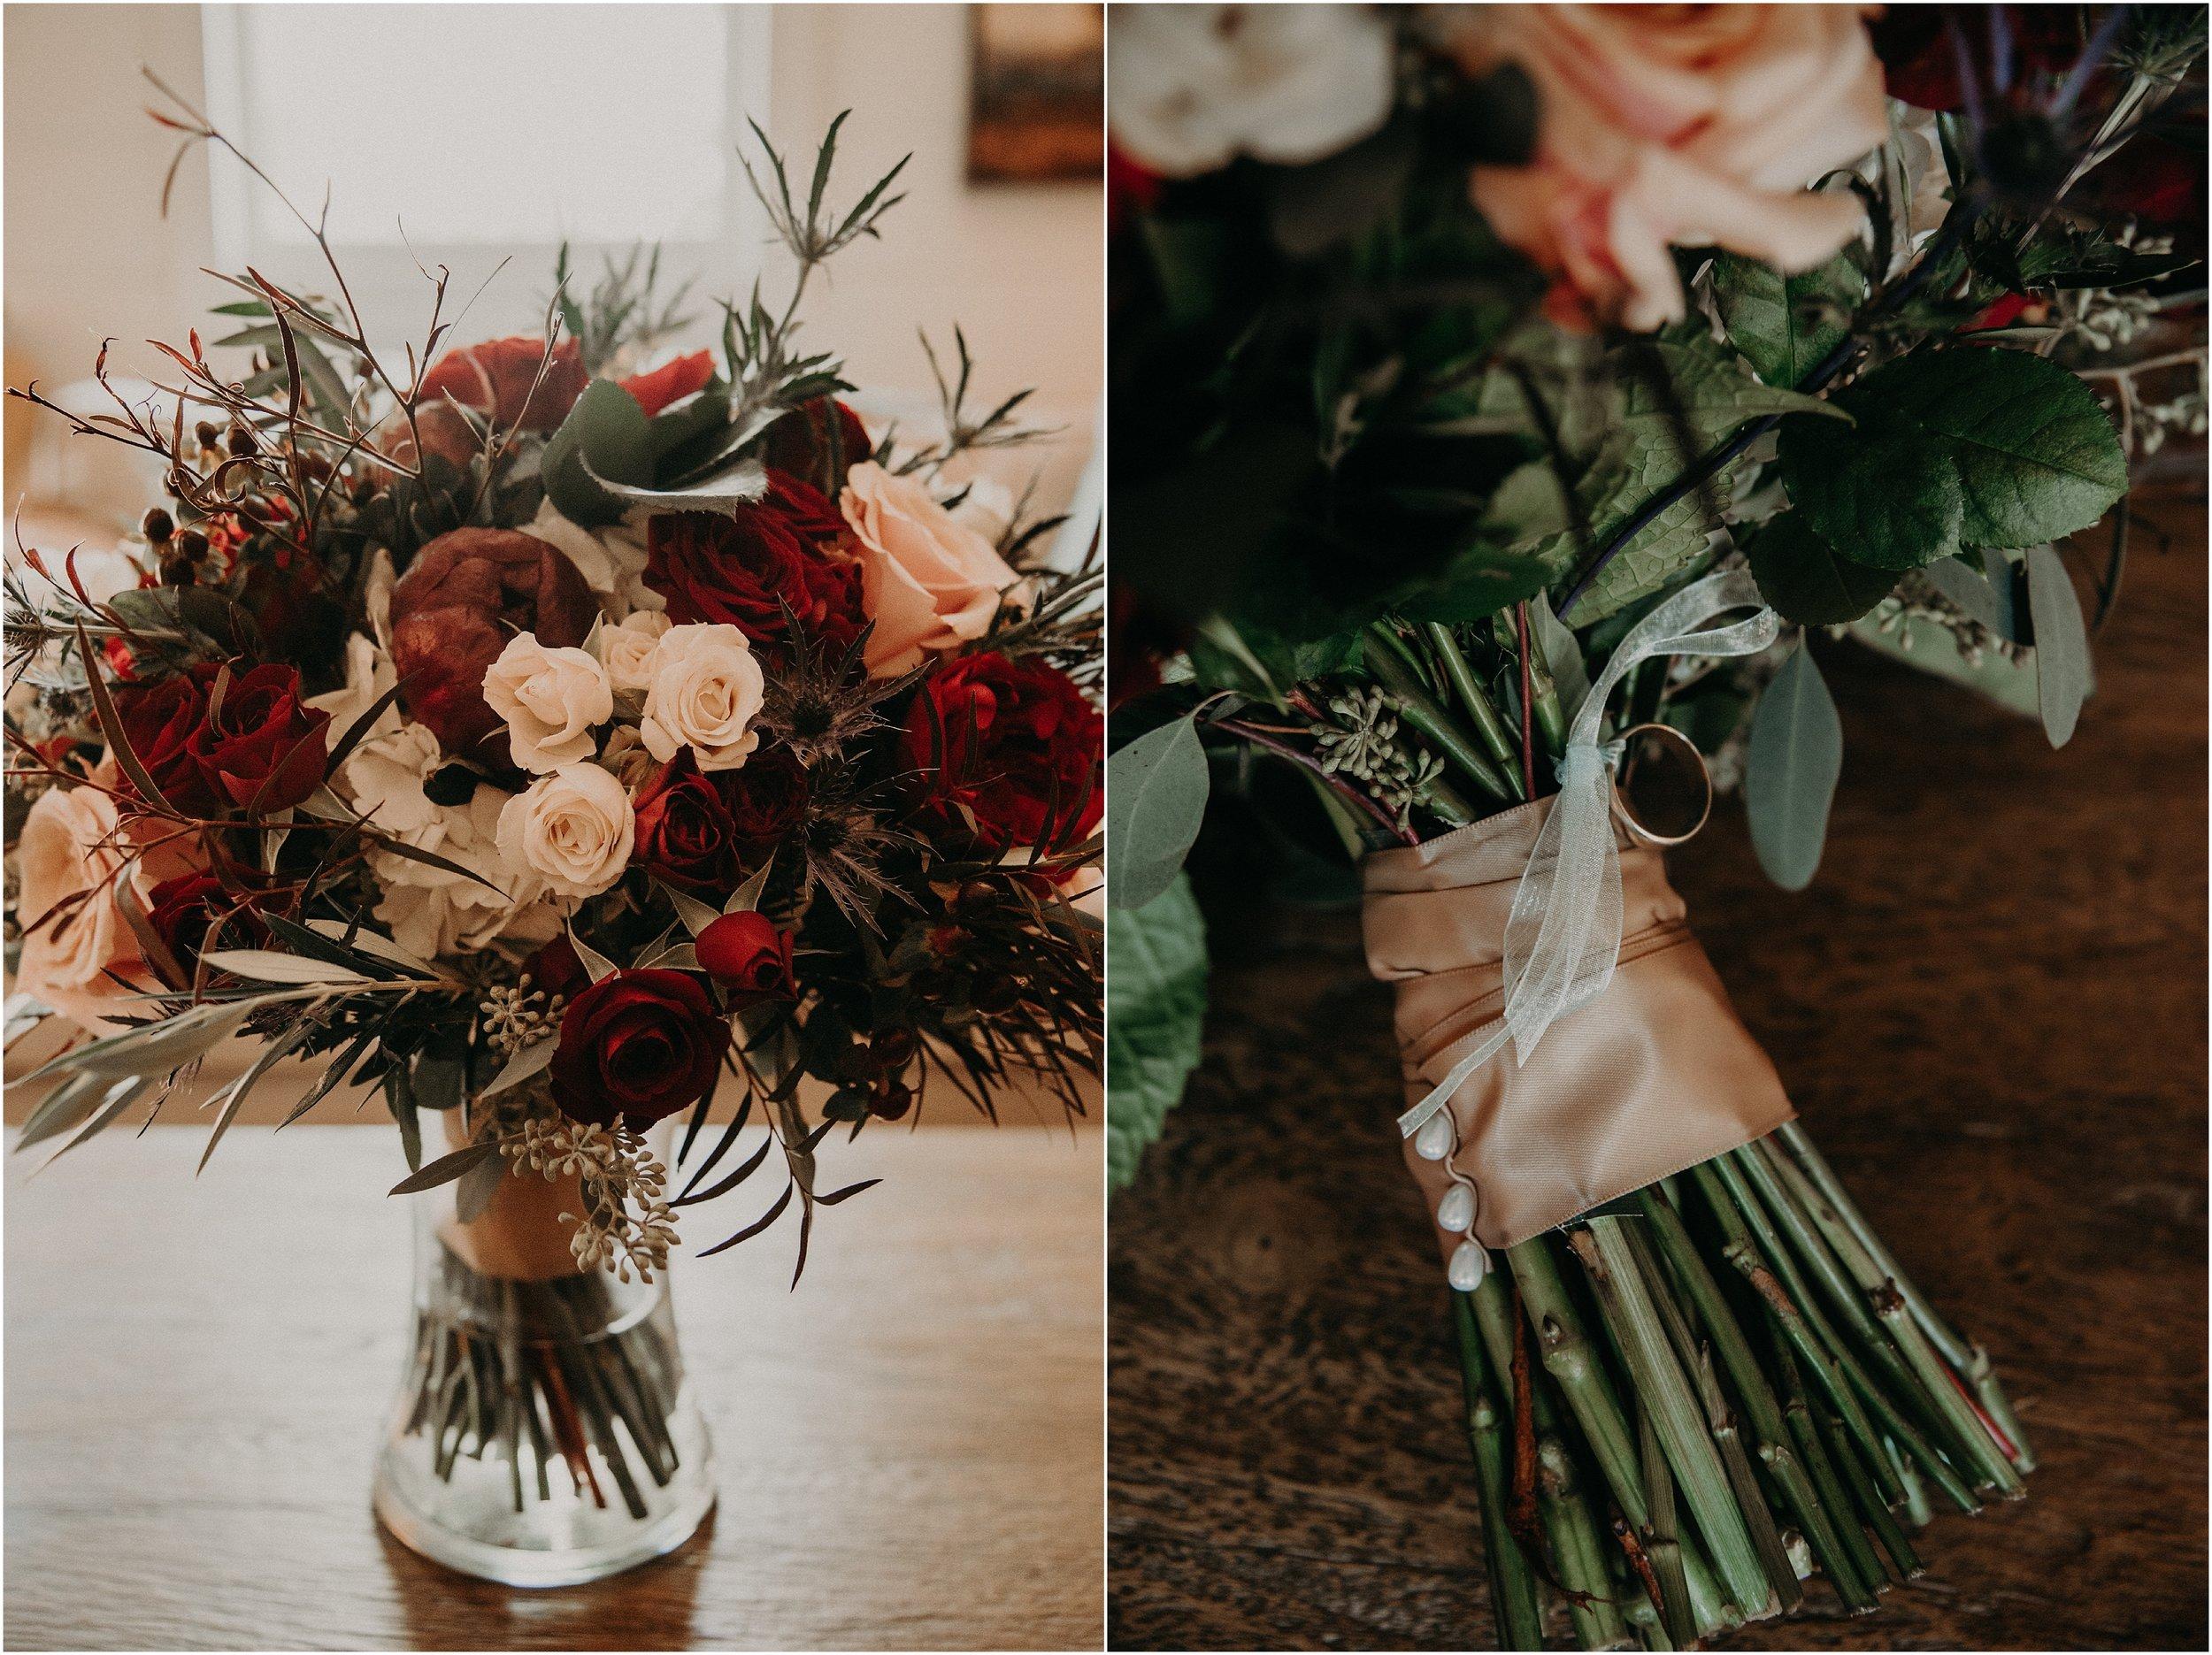 Wedding bouquet by Chickamauga Florist